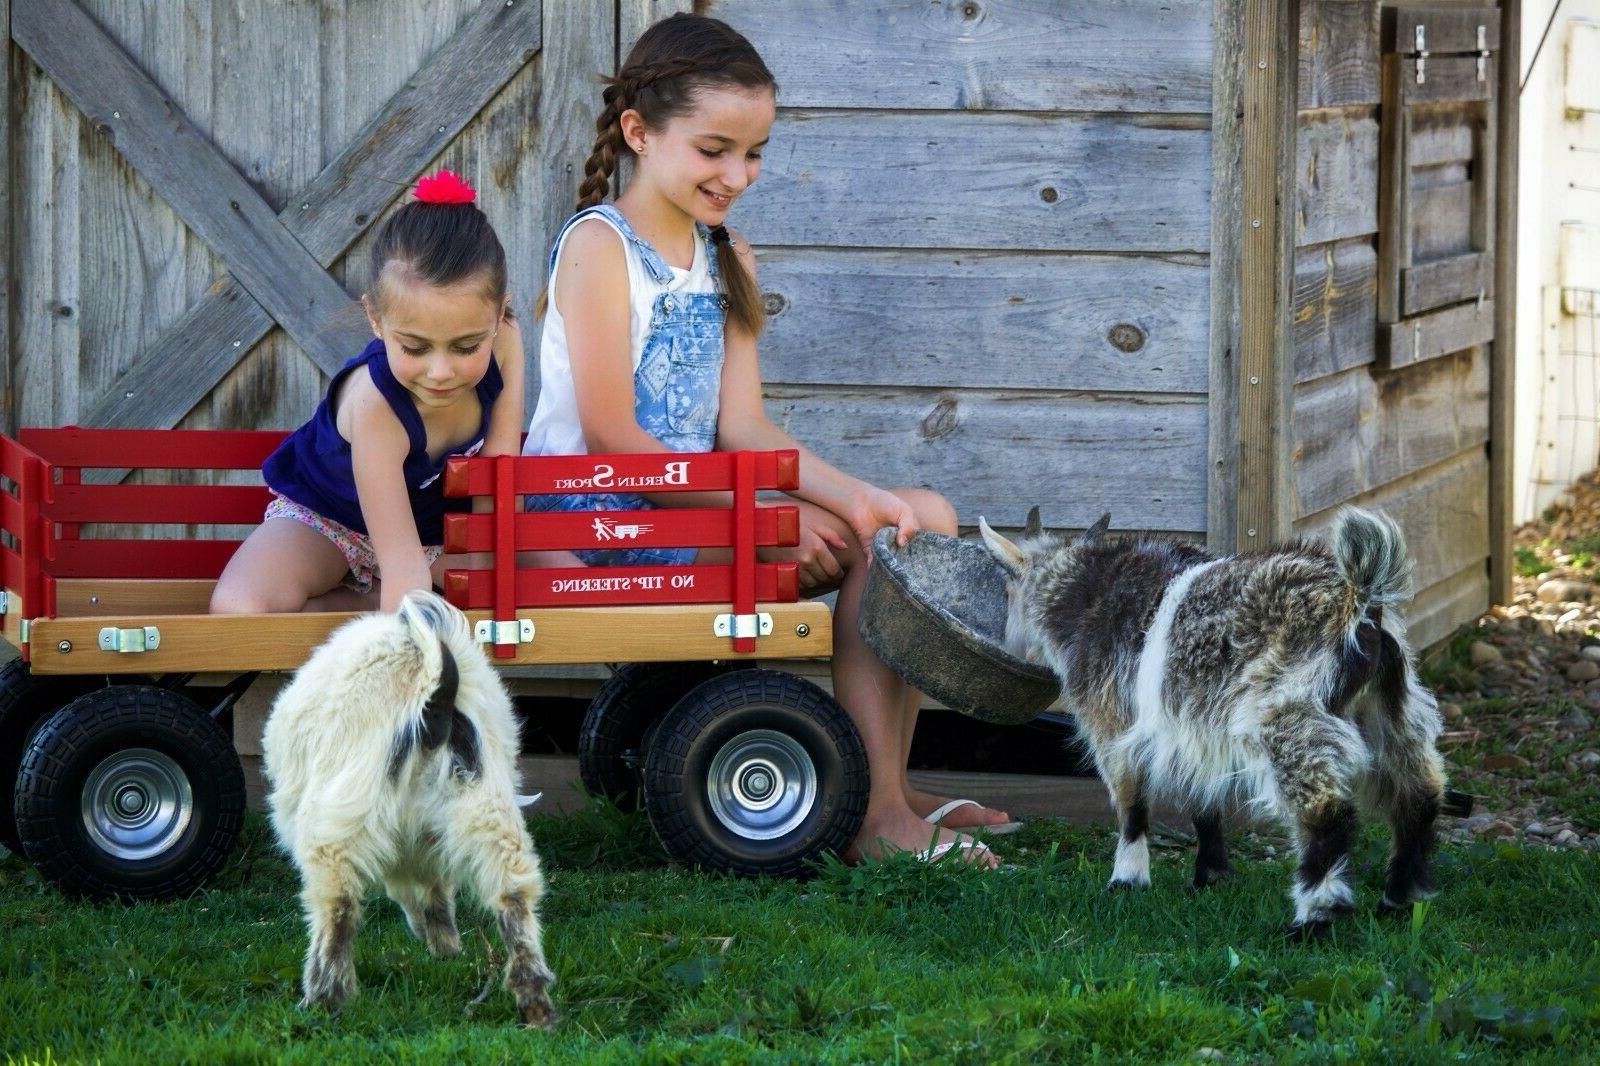 Amish-Made Sport Wagon, Wagon, Red